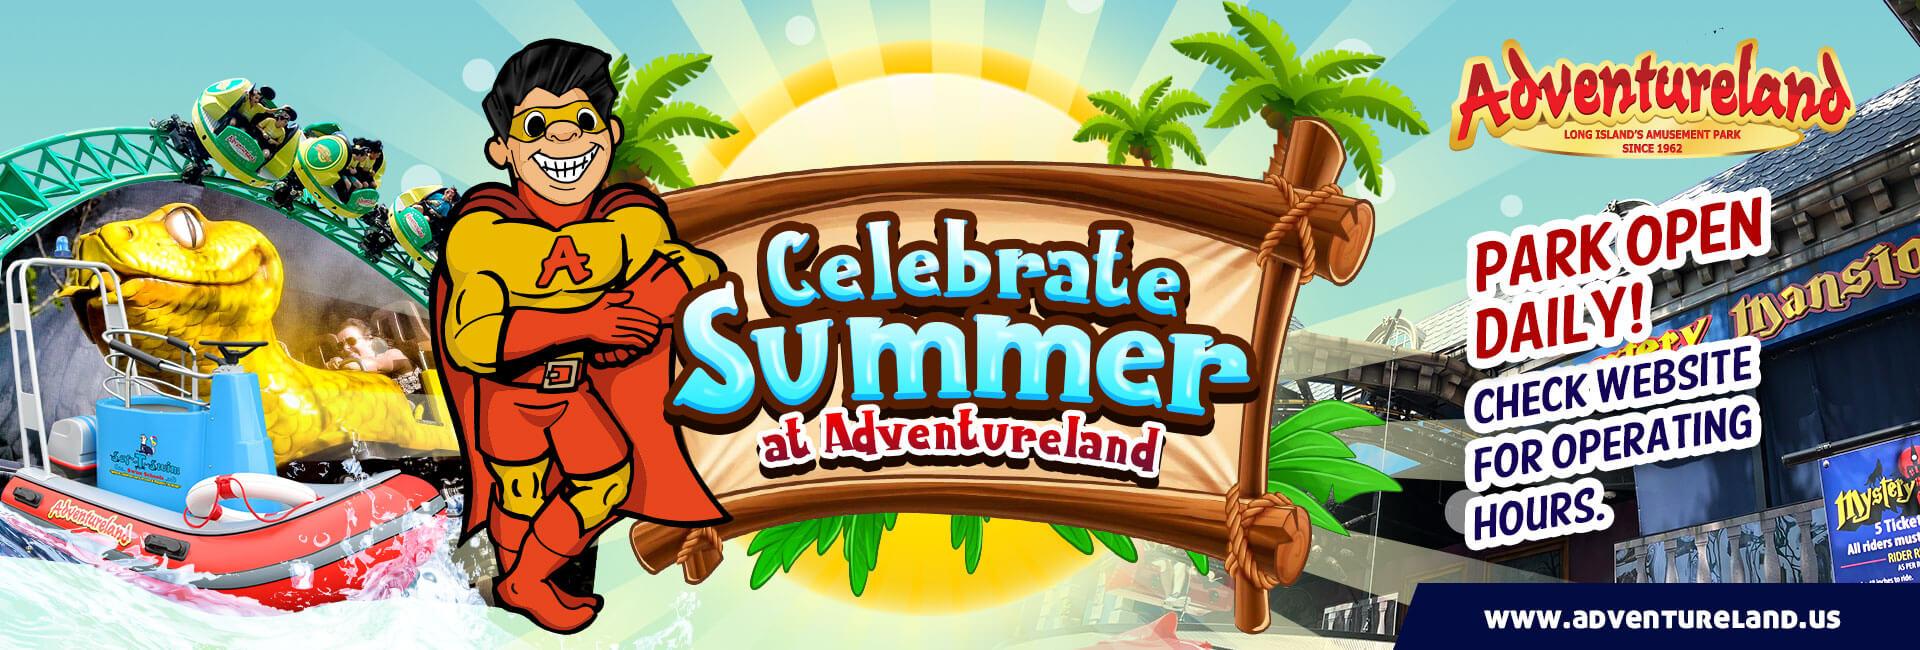 Celebrate Summer at Adventureland